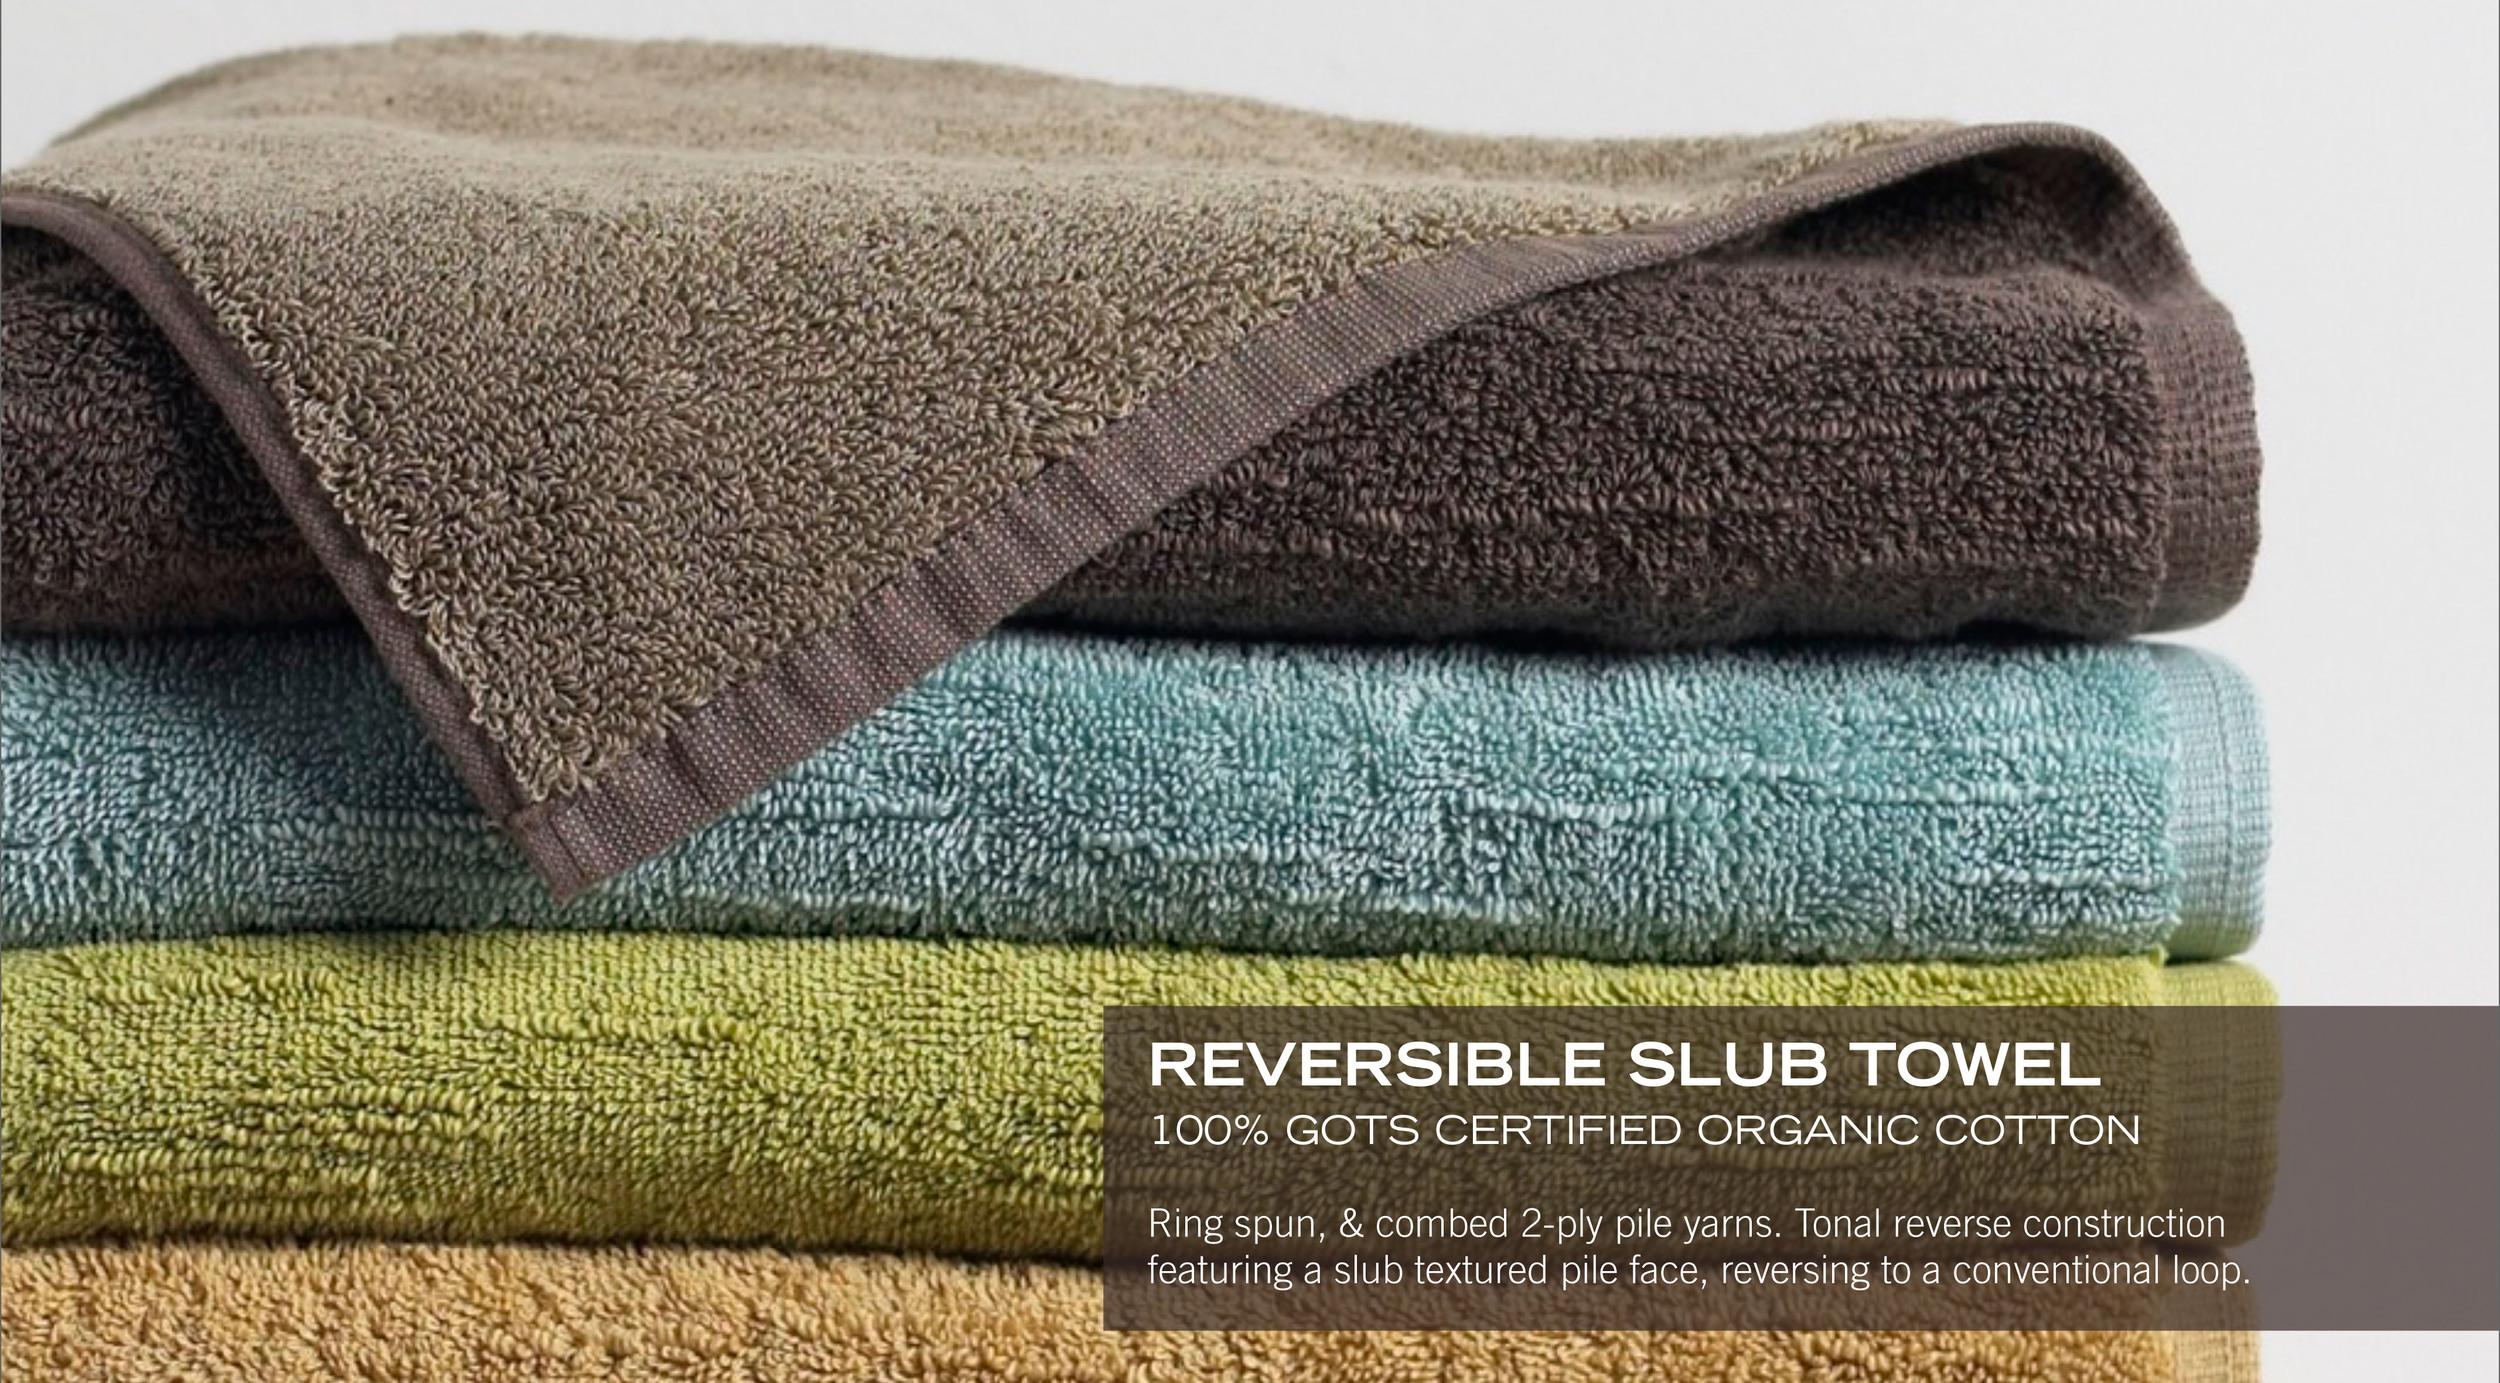 Portico-Home-Organic-Cotton-towels.jpg